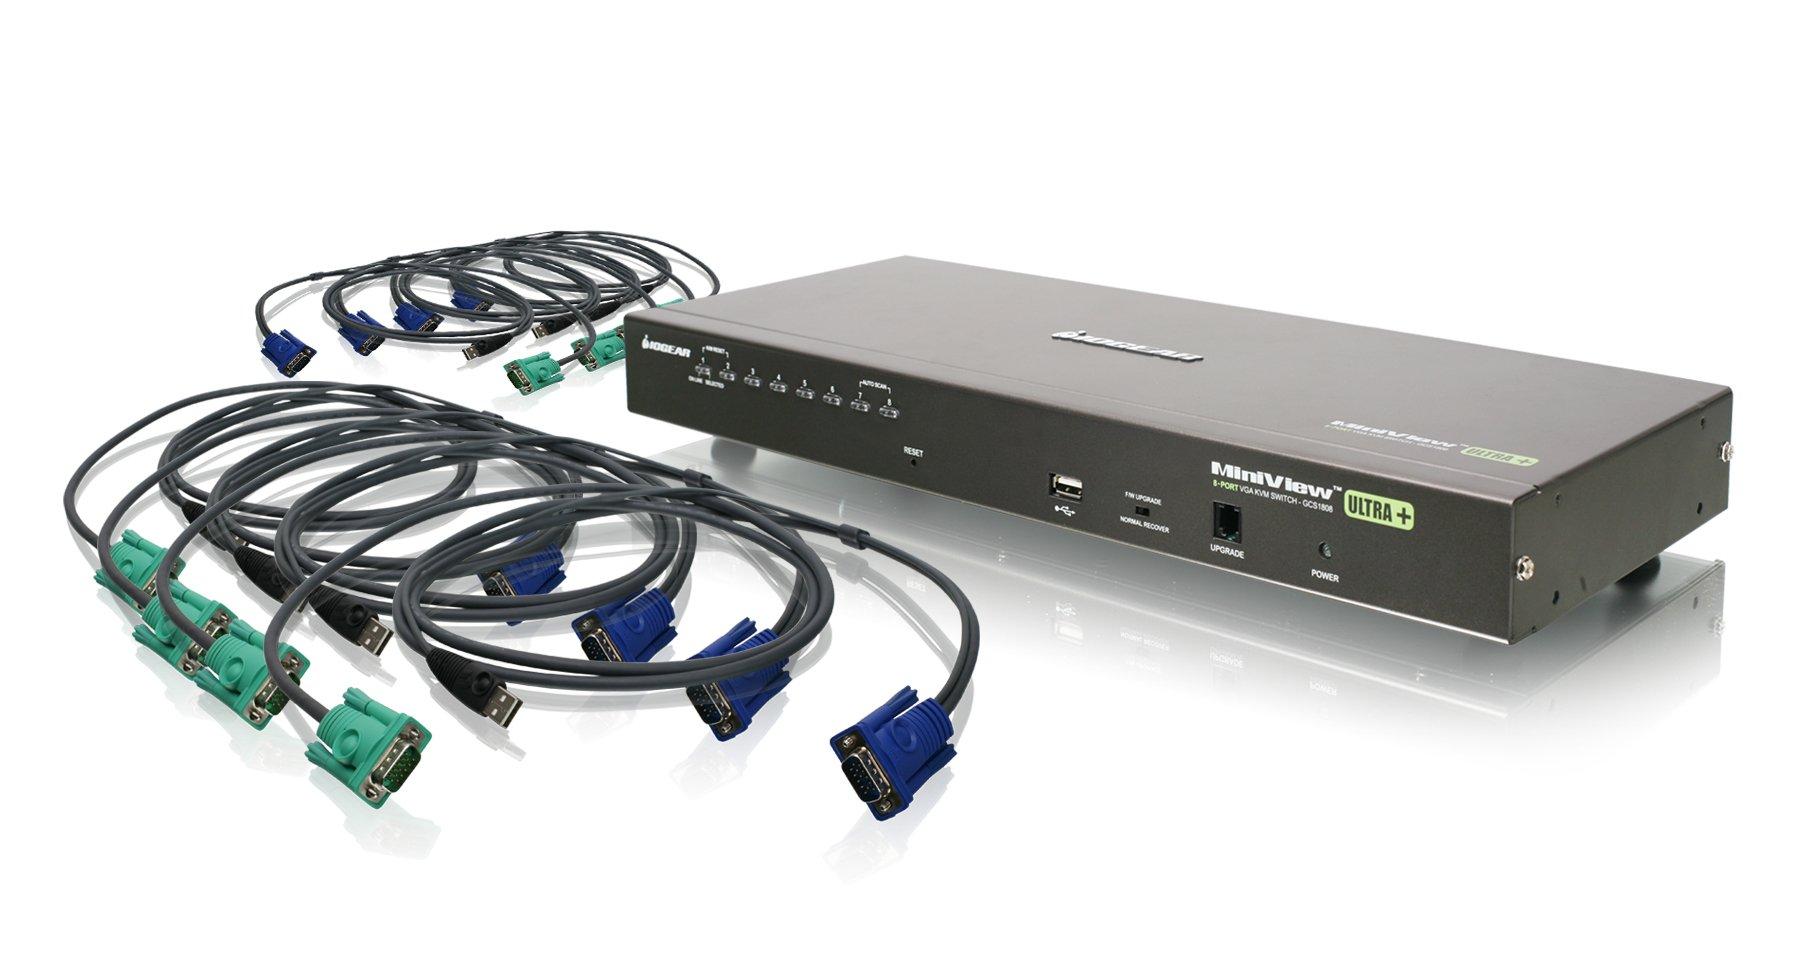 IOGEAR 8-Port USB PS/2 Combo VGA KVMP Switch with USB KVM Cables, GCS1808KITU by IOGEAR